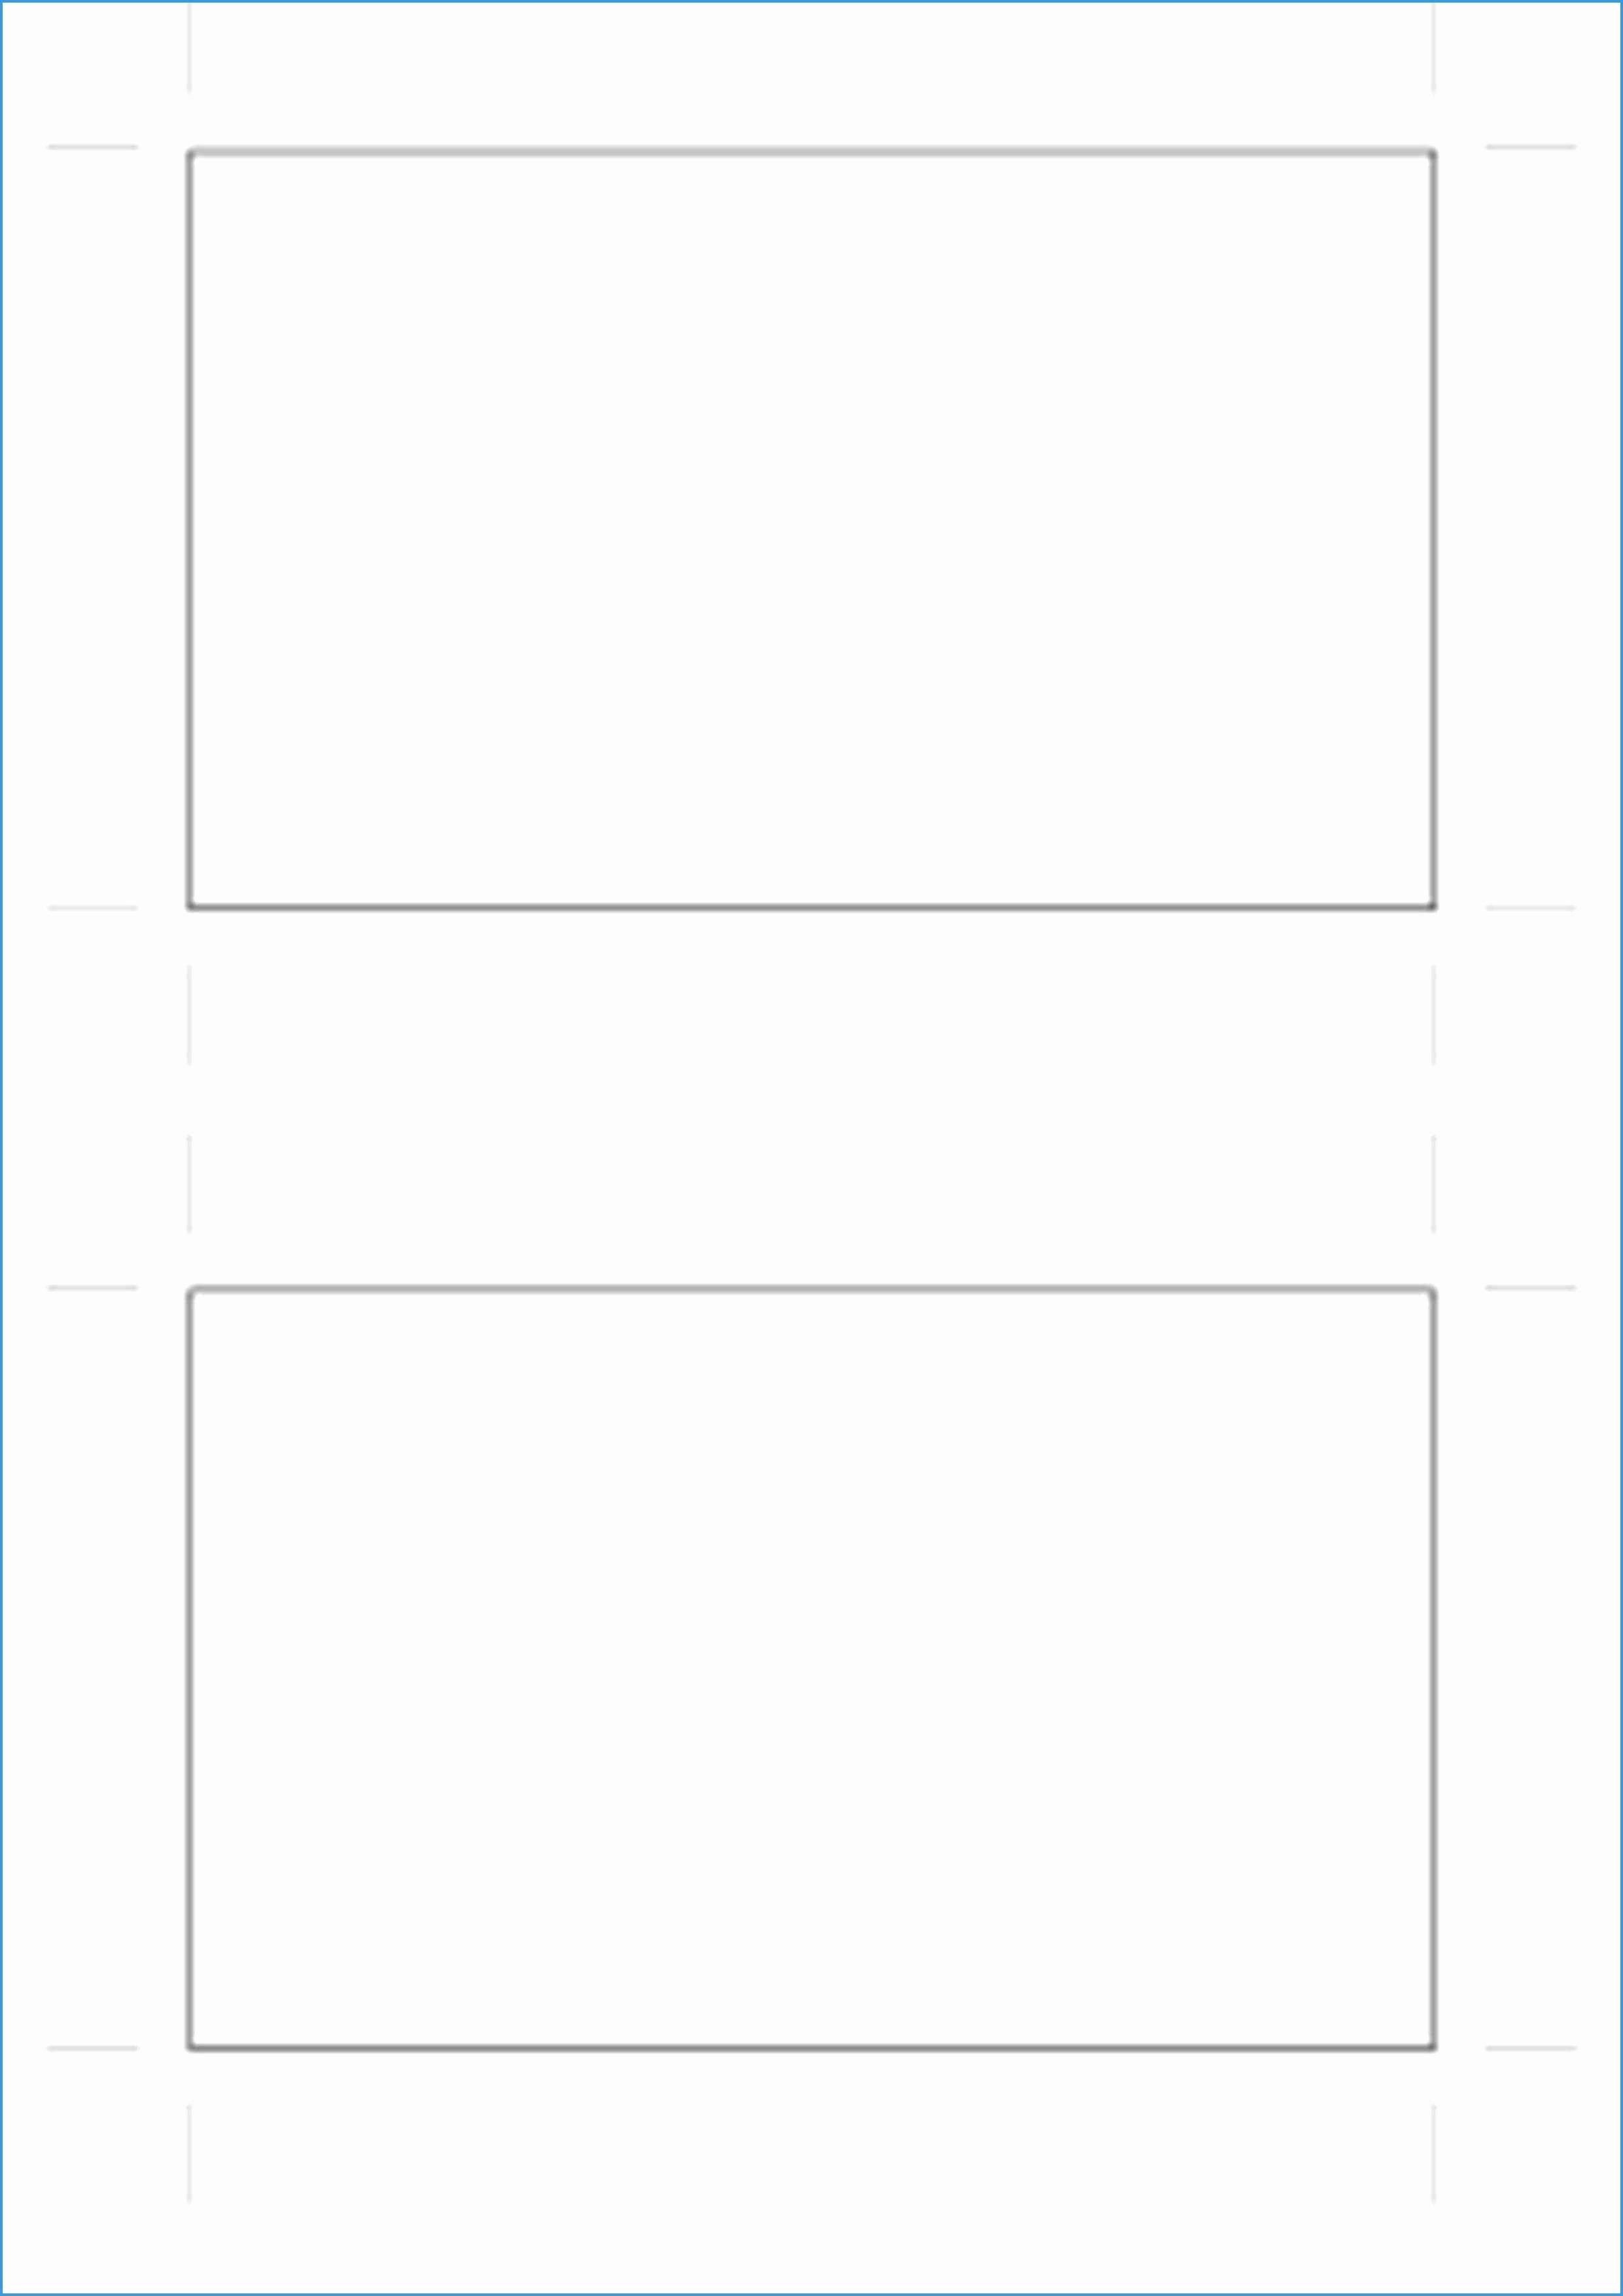 Beautiful Word Blank Business Card Template Free For Plain Business Card Template Microsoft Word